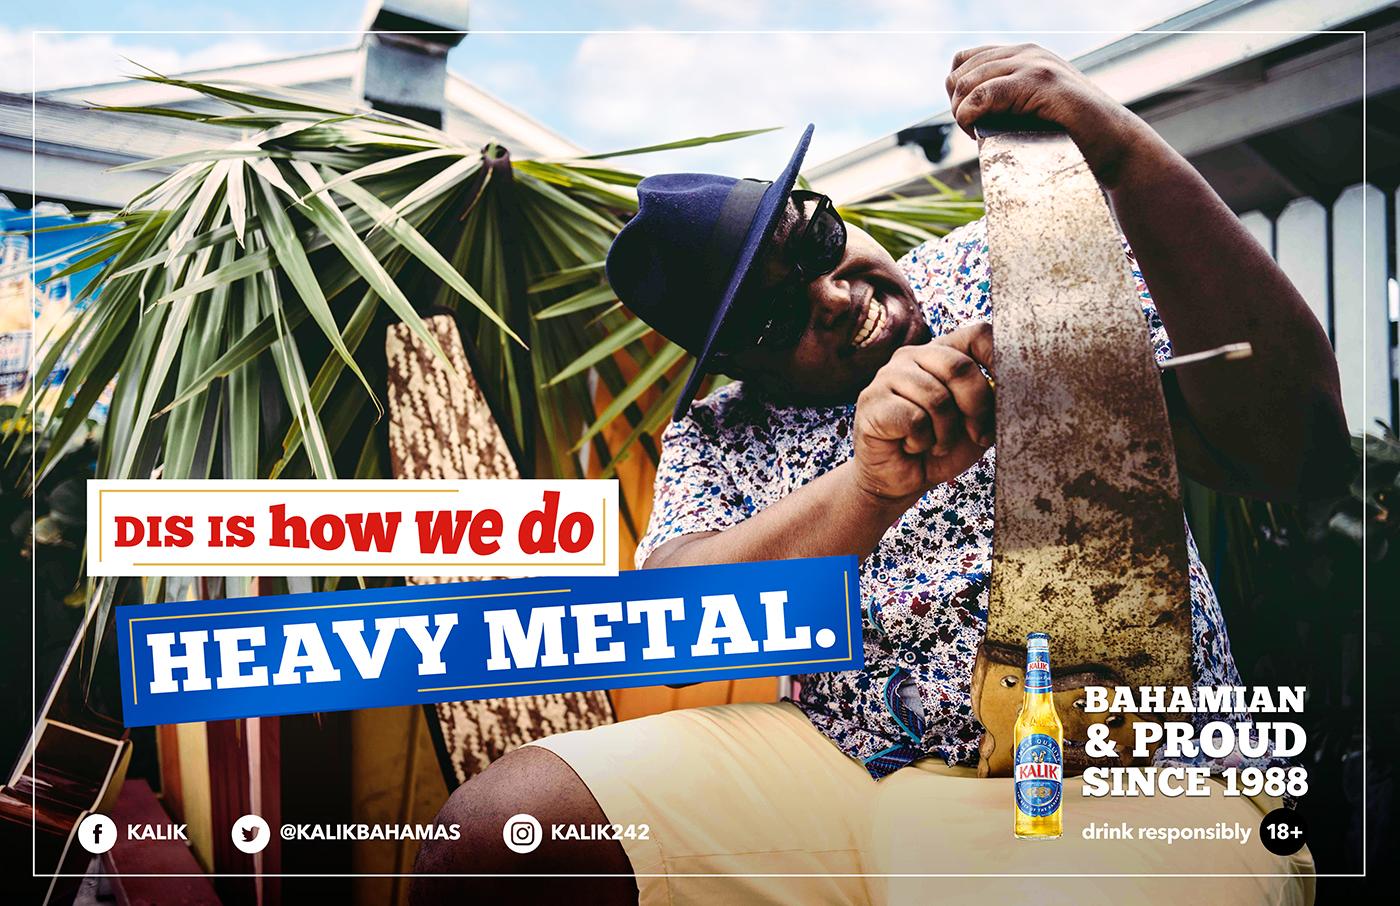 Kalik work - Dis Is How We Do Heavy Metal_final.jpg